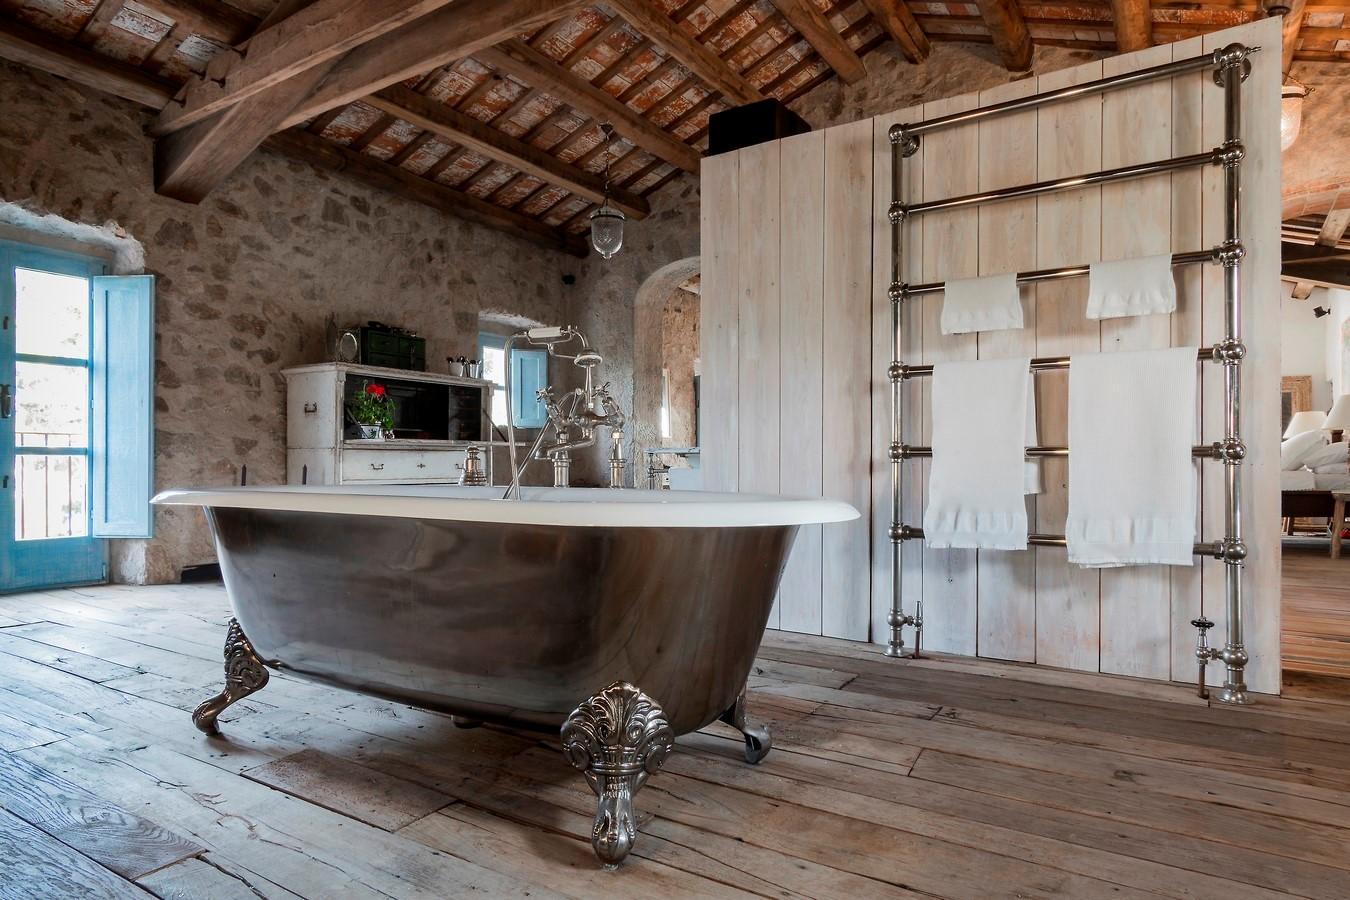 Catalan Farmhouse by Ana Engelhorn Interior Design Ltd - Sheet3